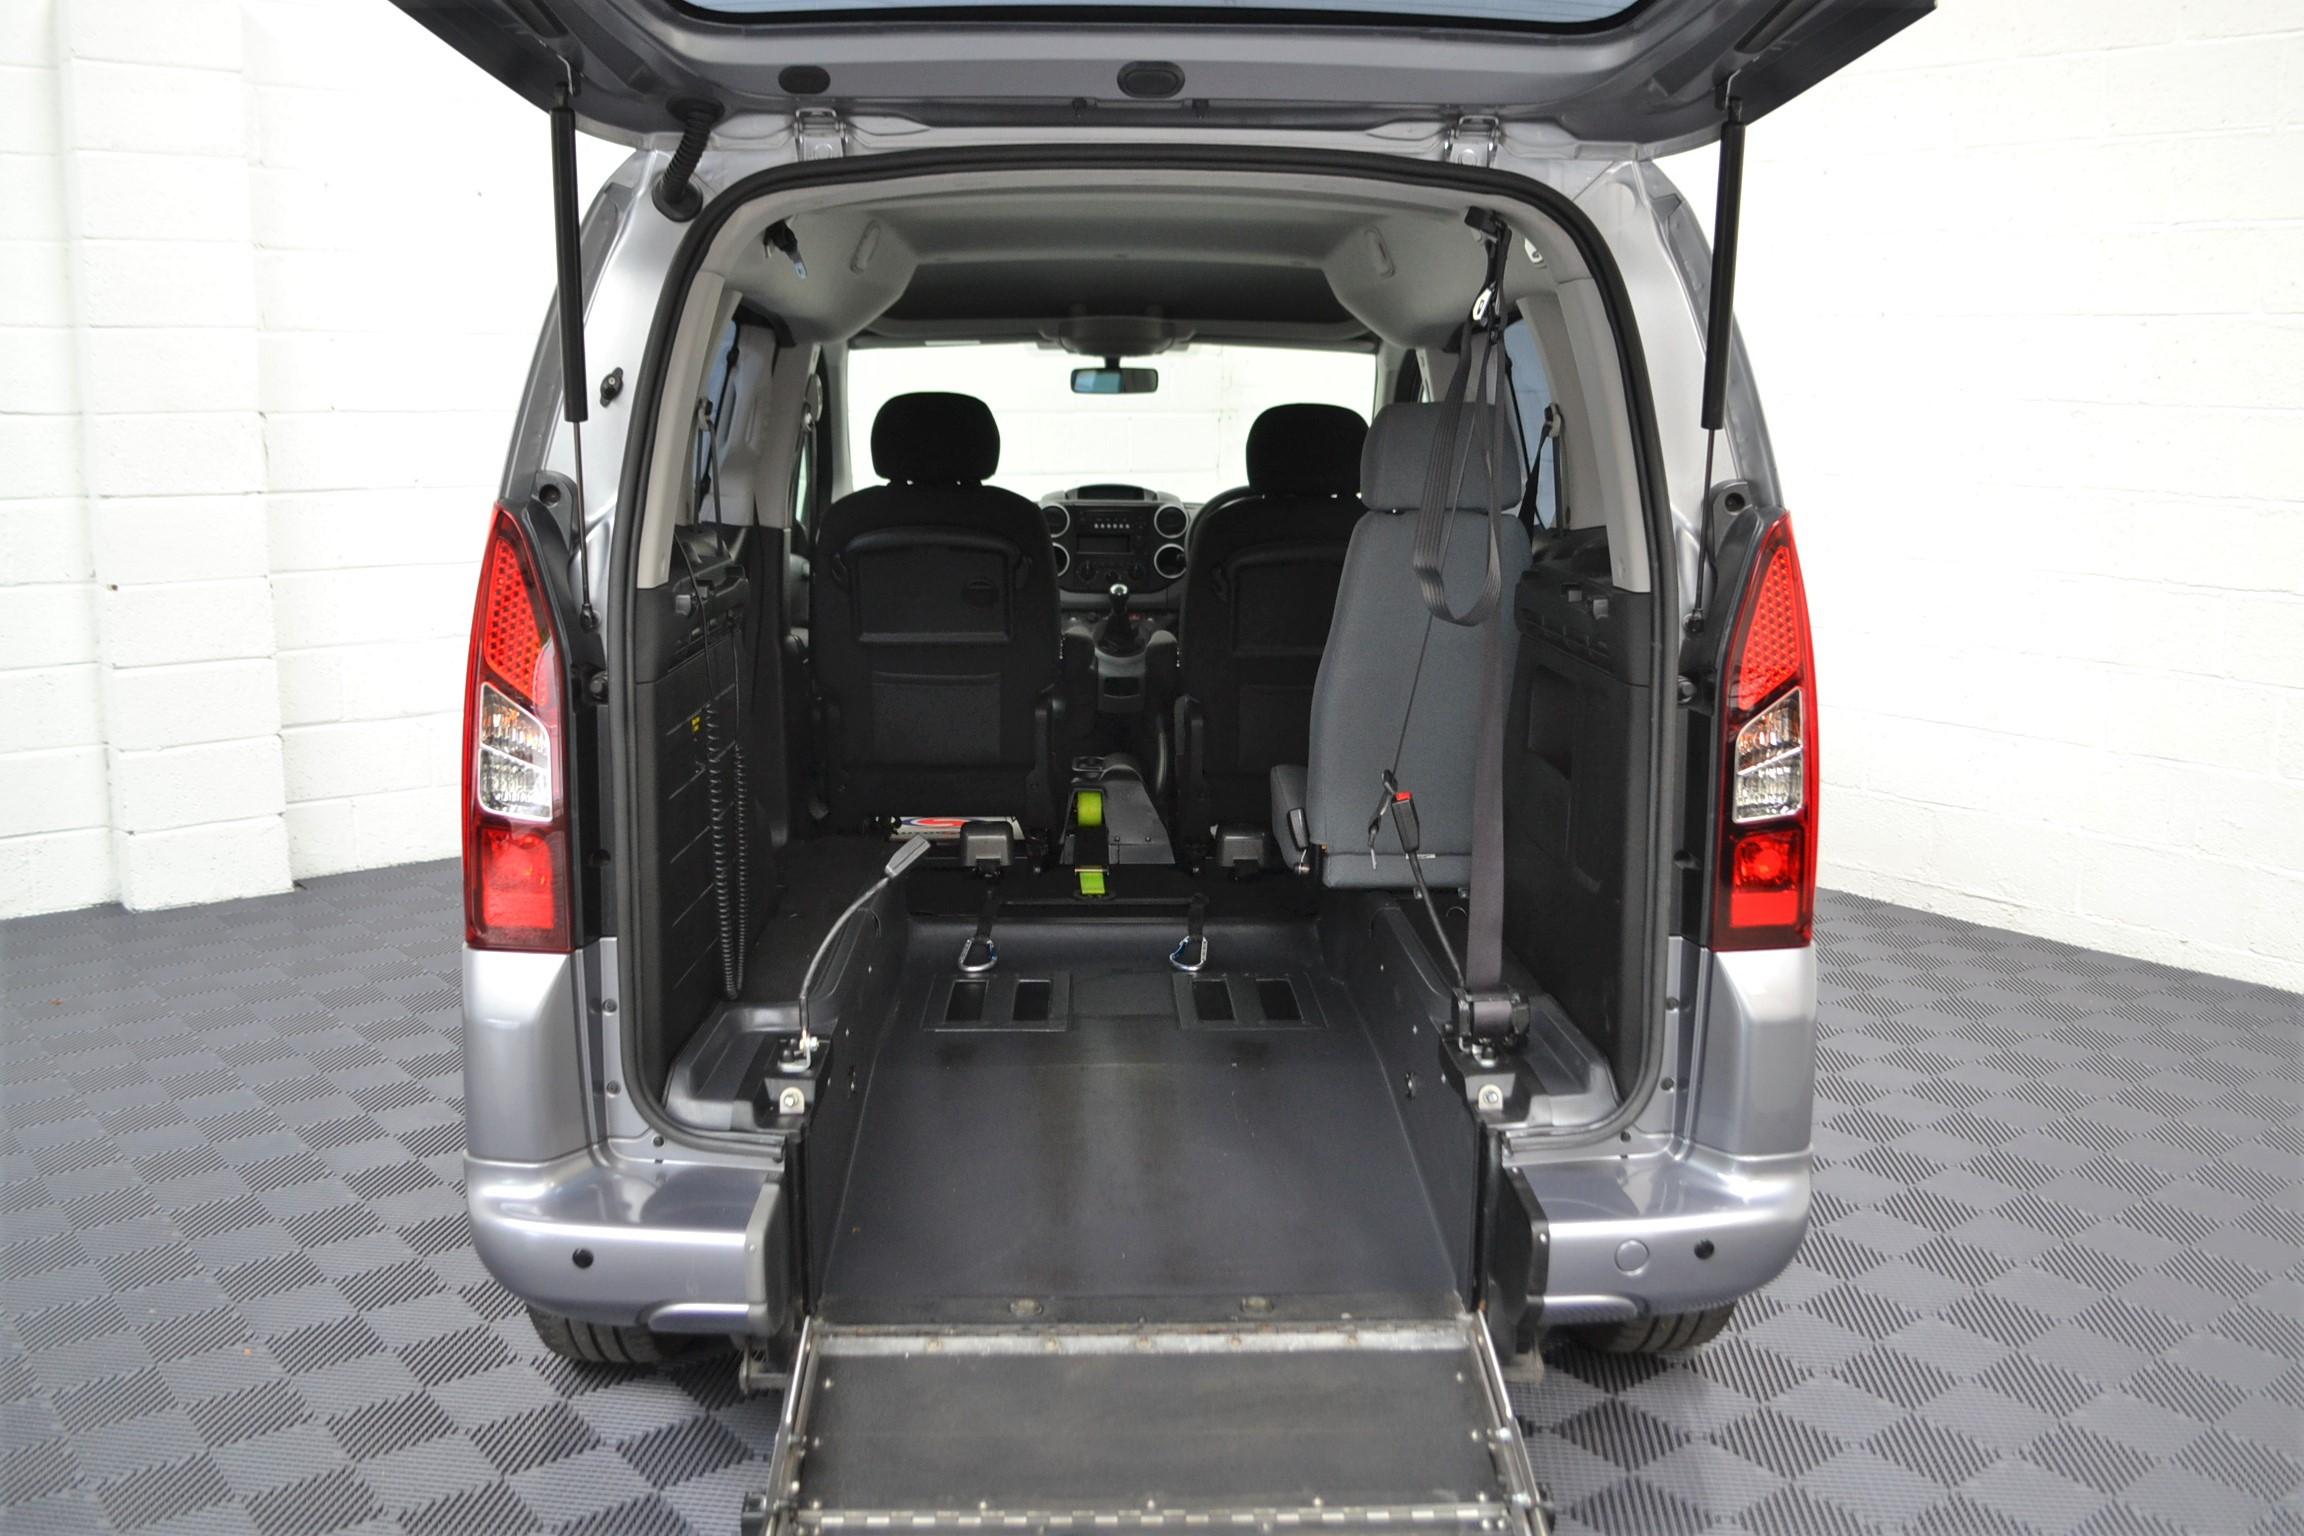 Used Wav Cars for Sale UK Citroen Berlingo WAV Car Peugeot Partner Petrol Wheelchair Accessible Vehicles Buy Sell Bristol Somerset Devon Dorset 7